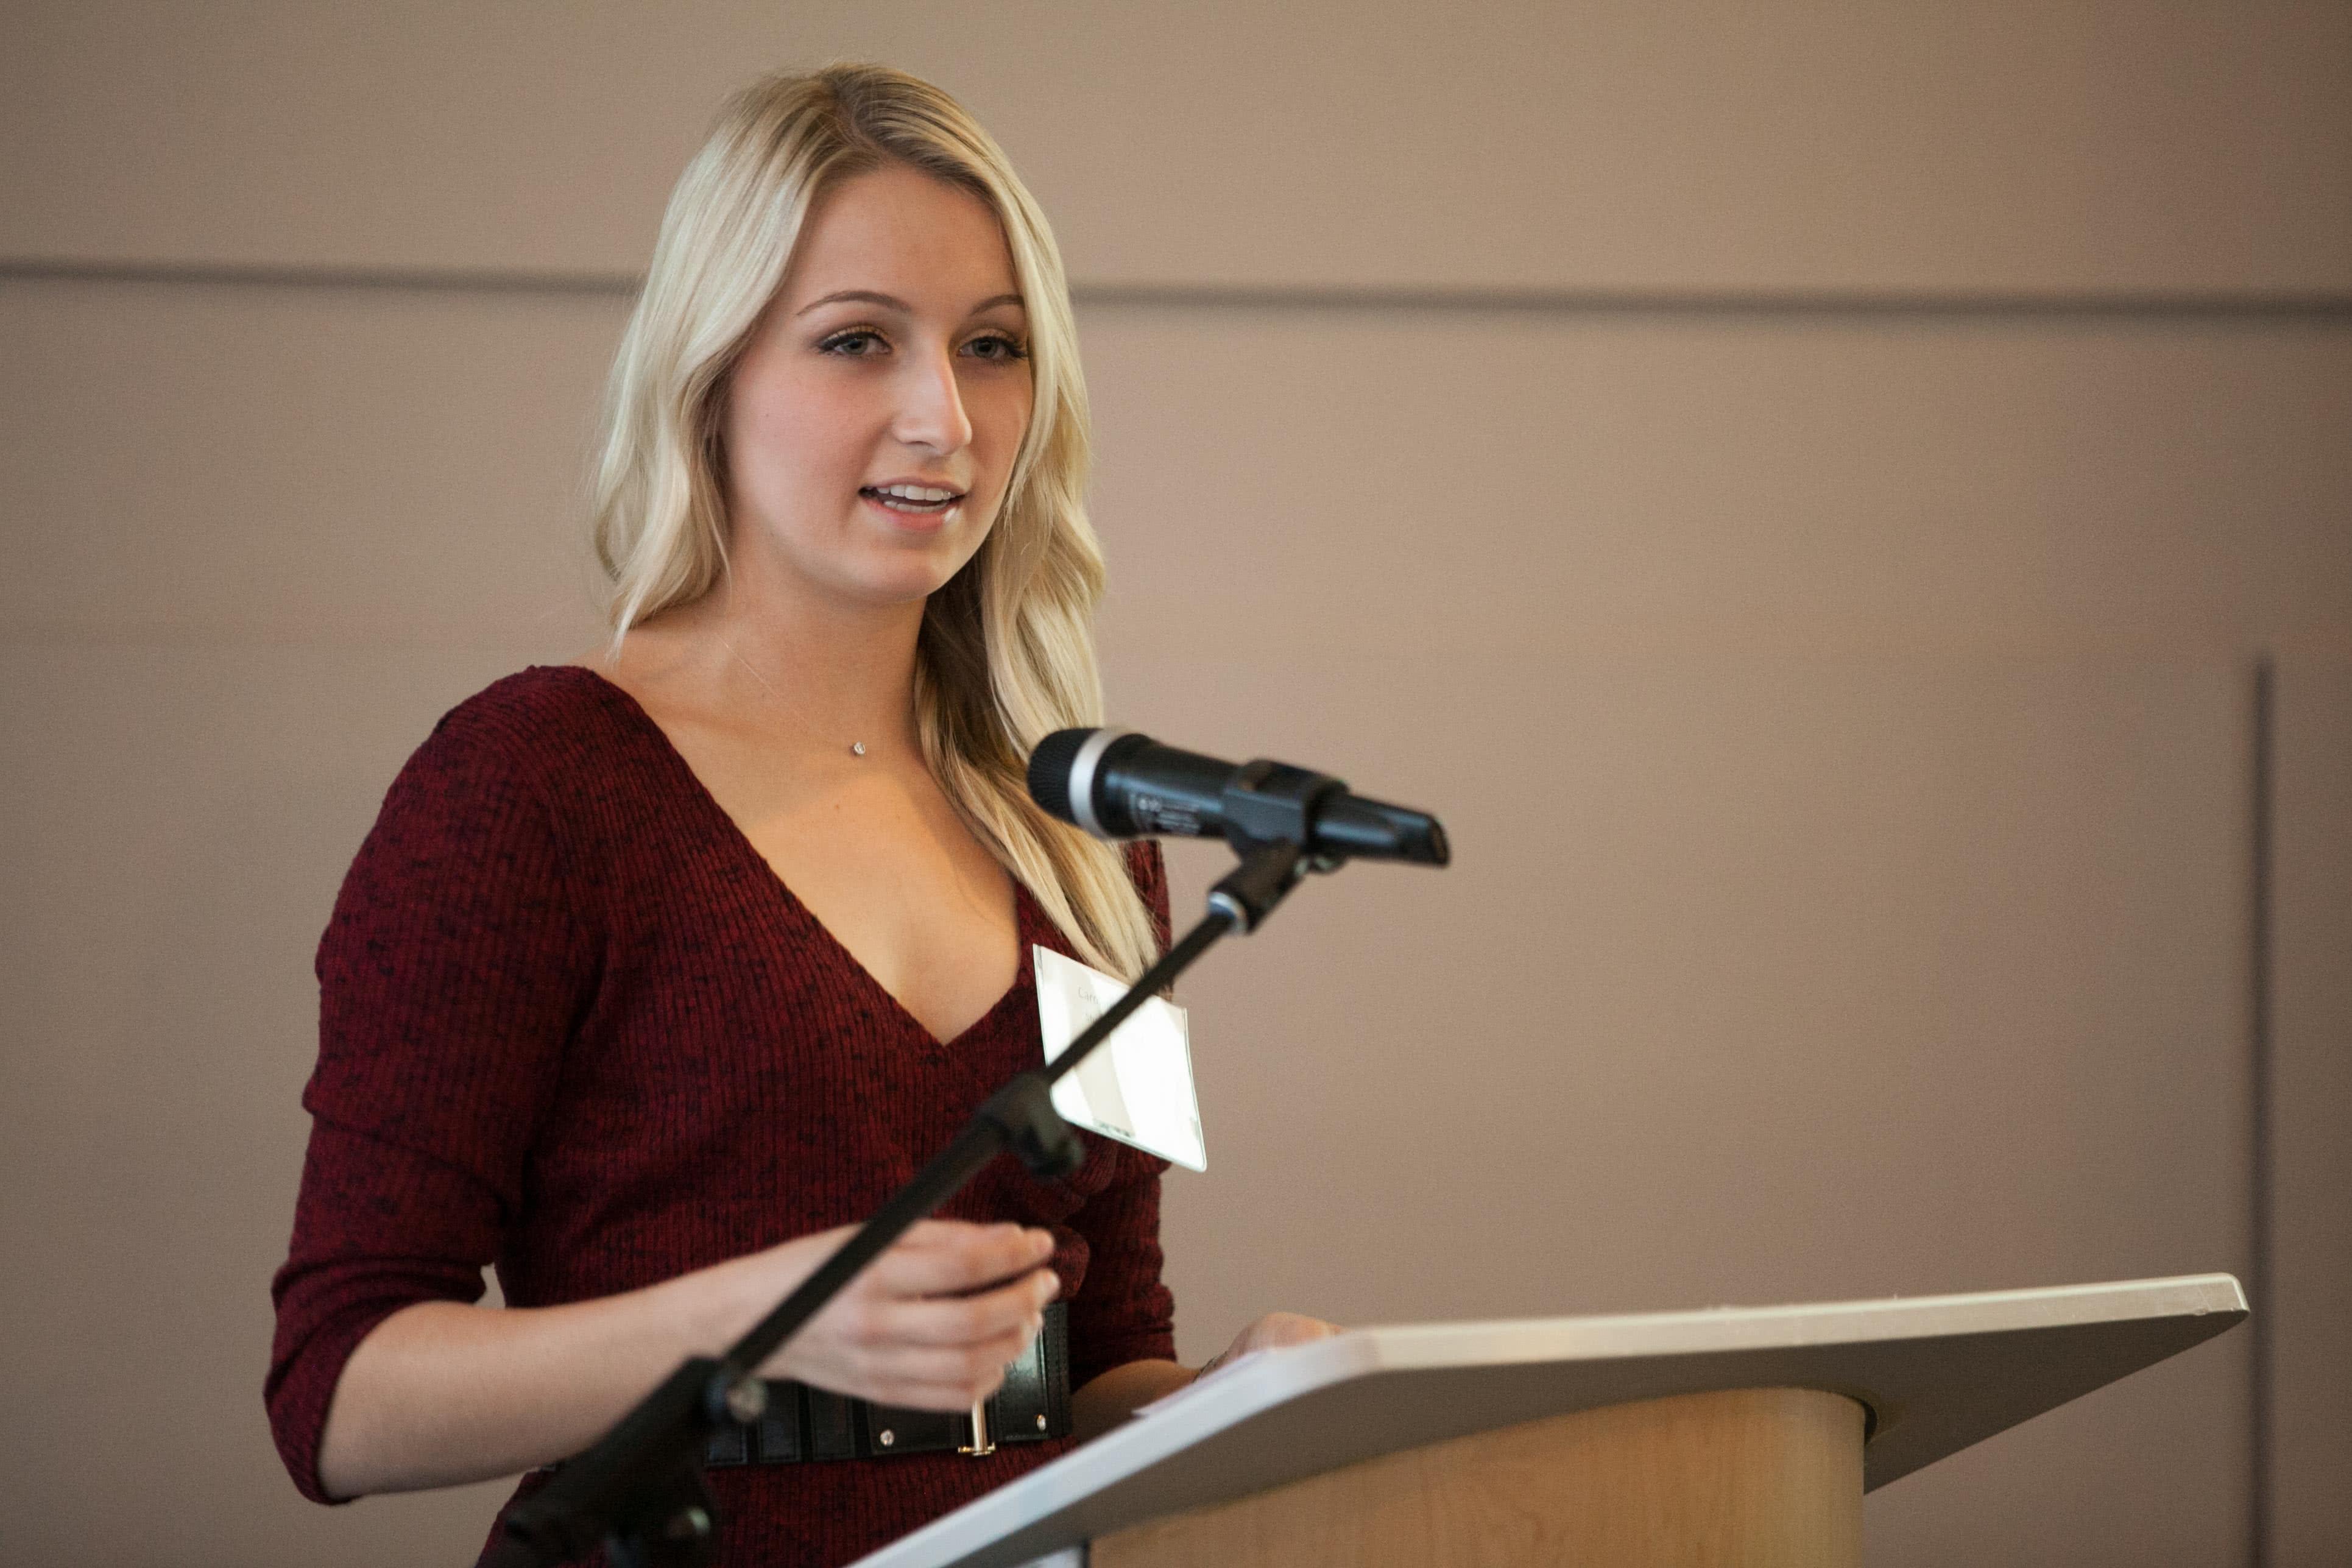 Caroline Wawro sharing her story